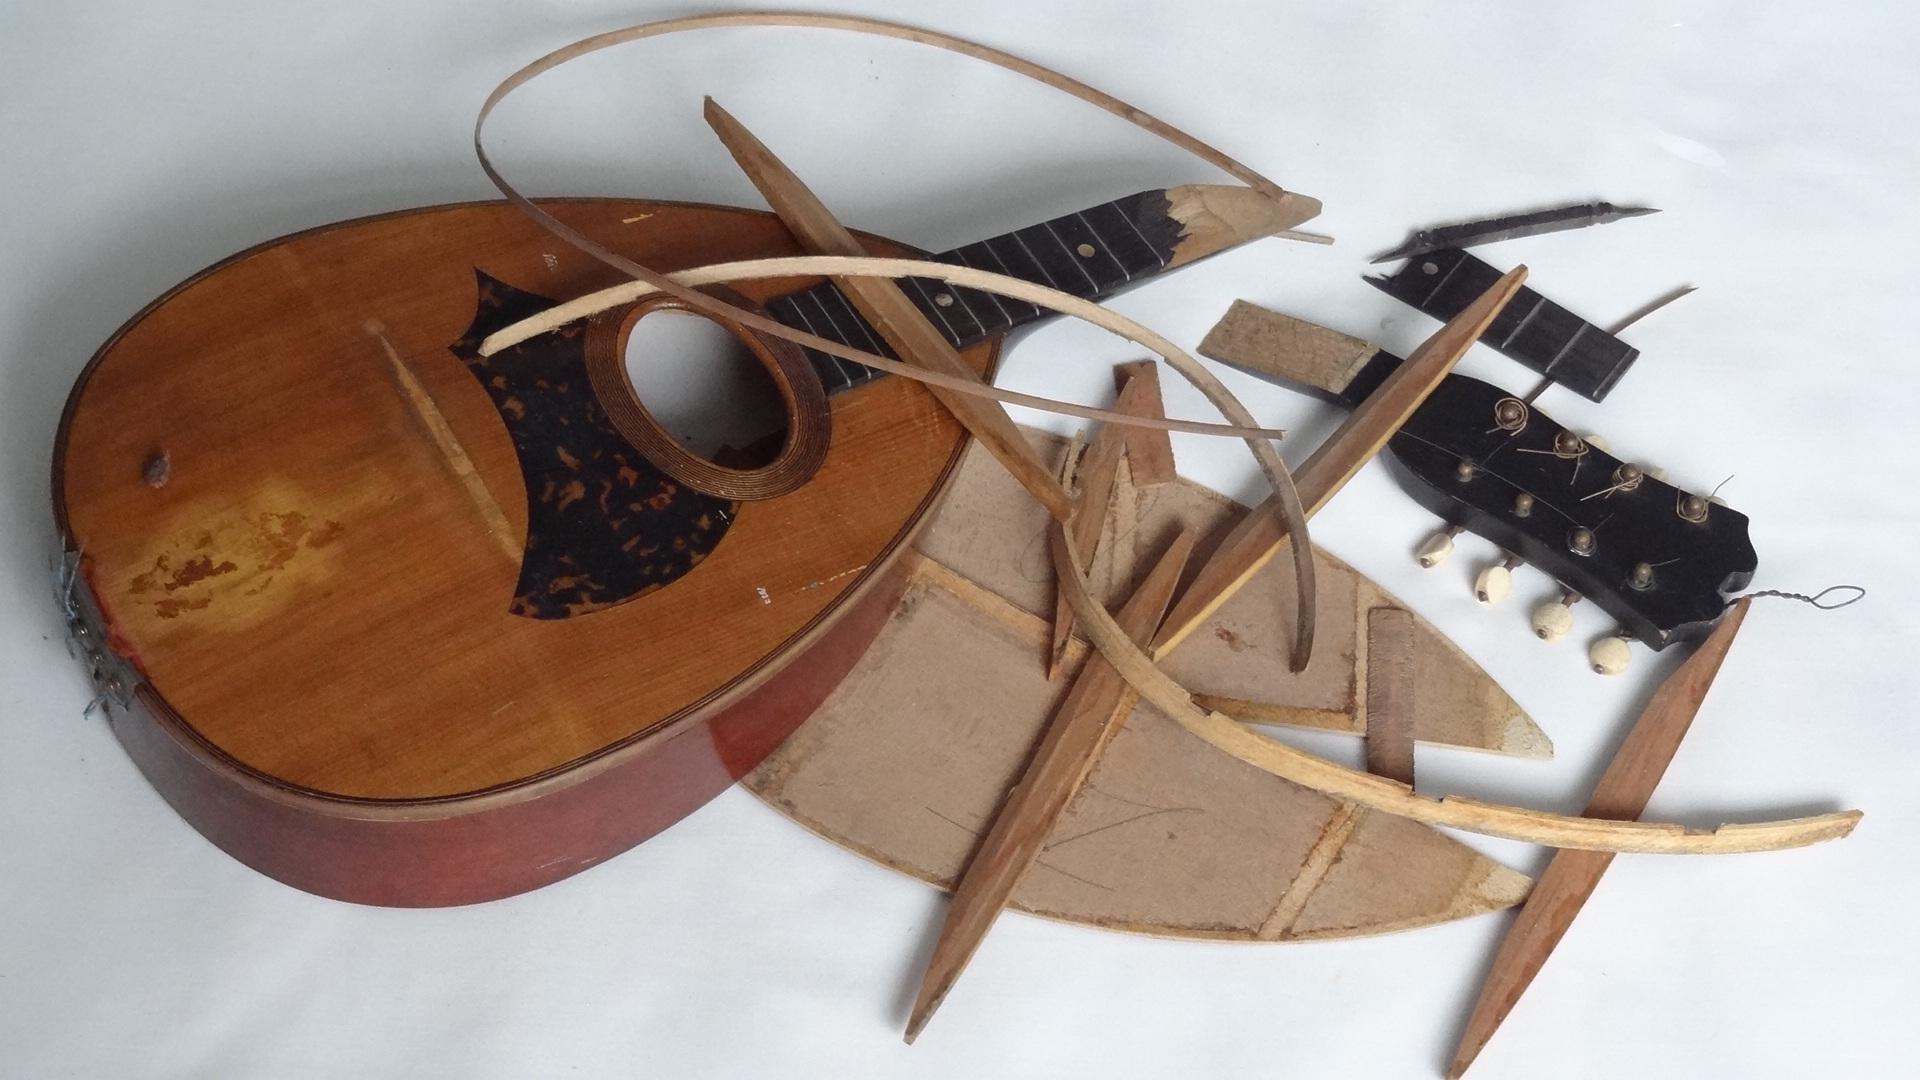 French Mandolin